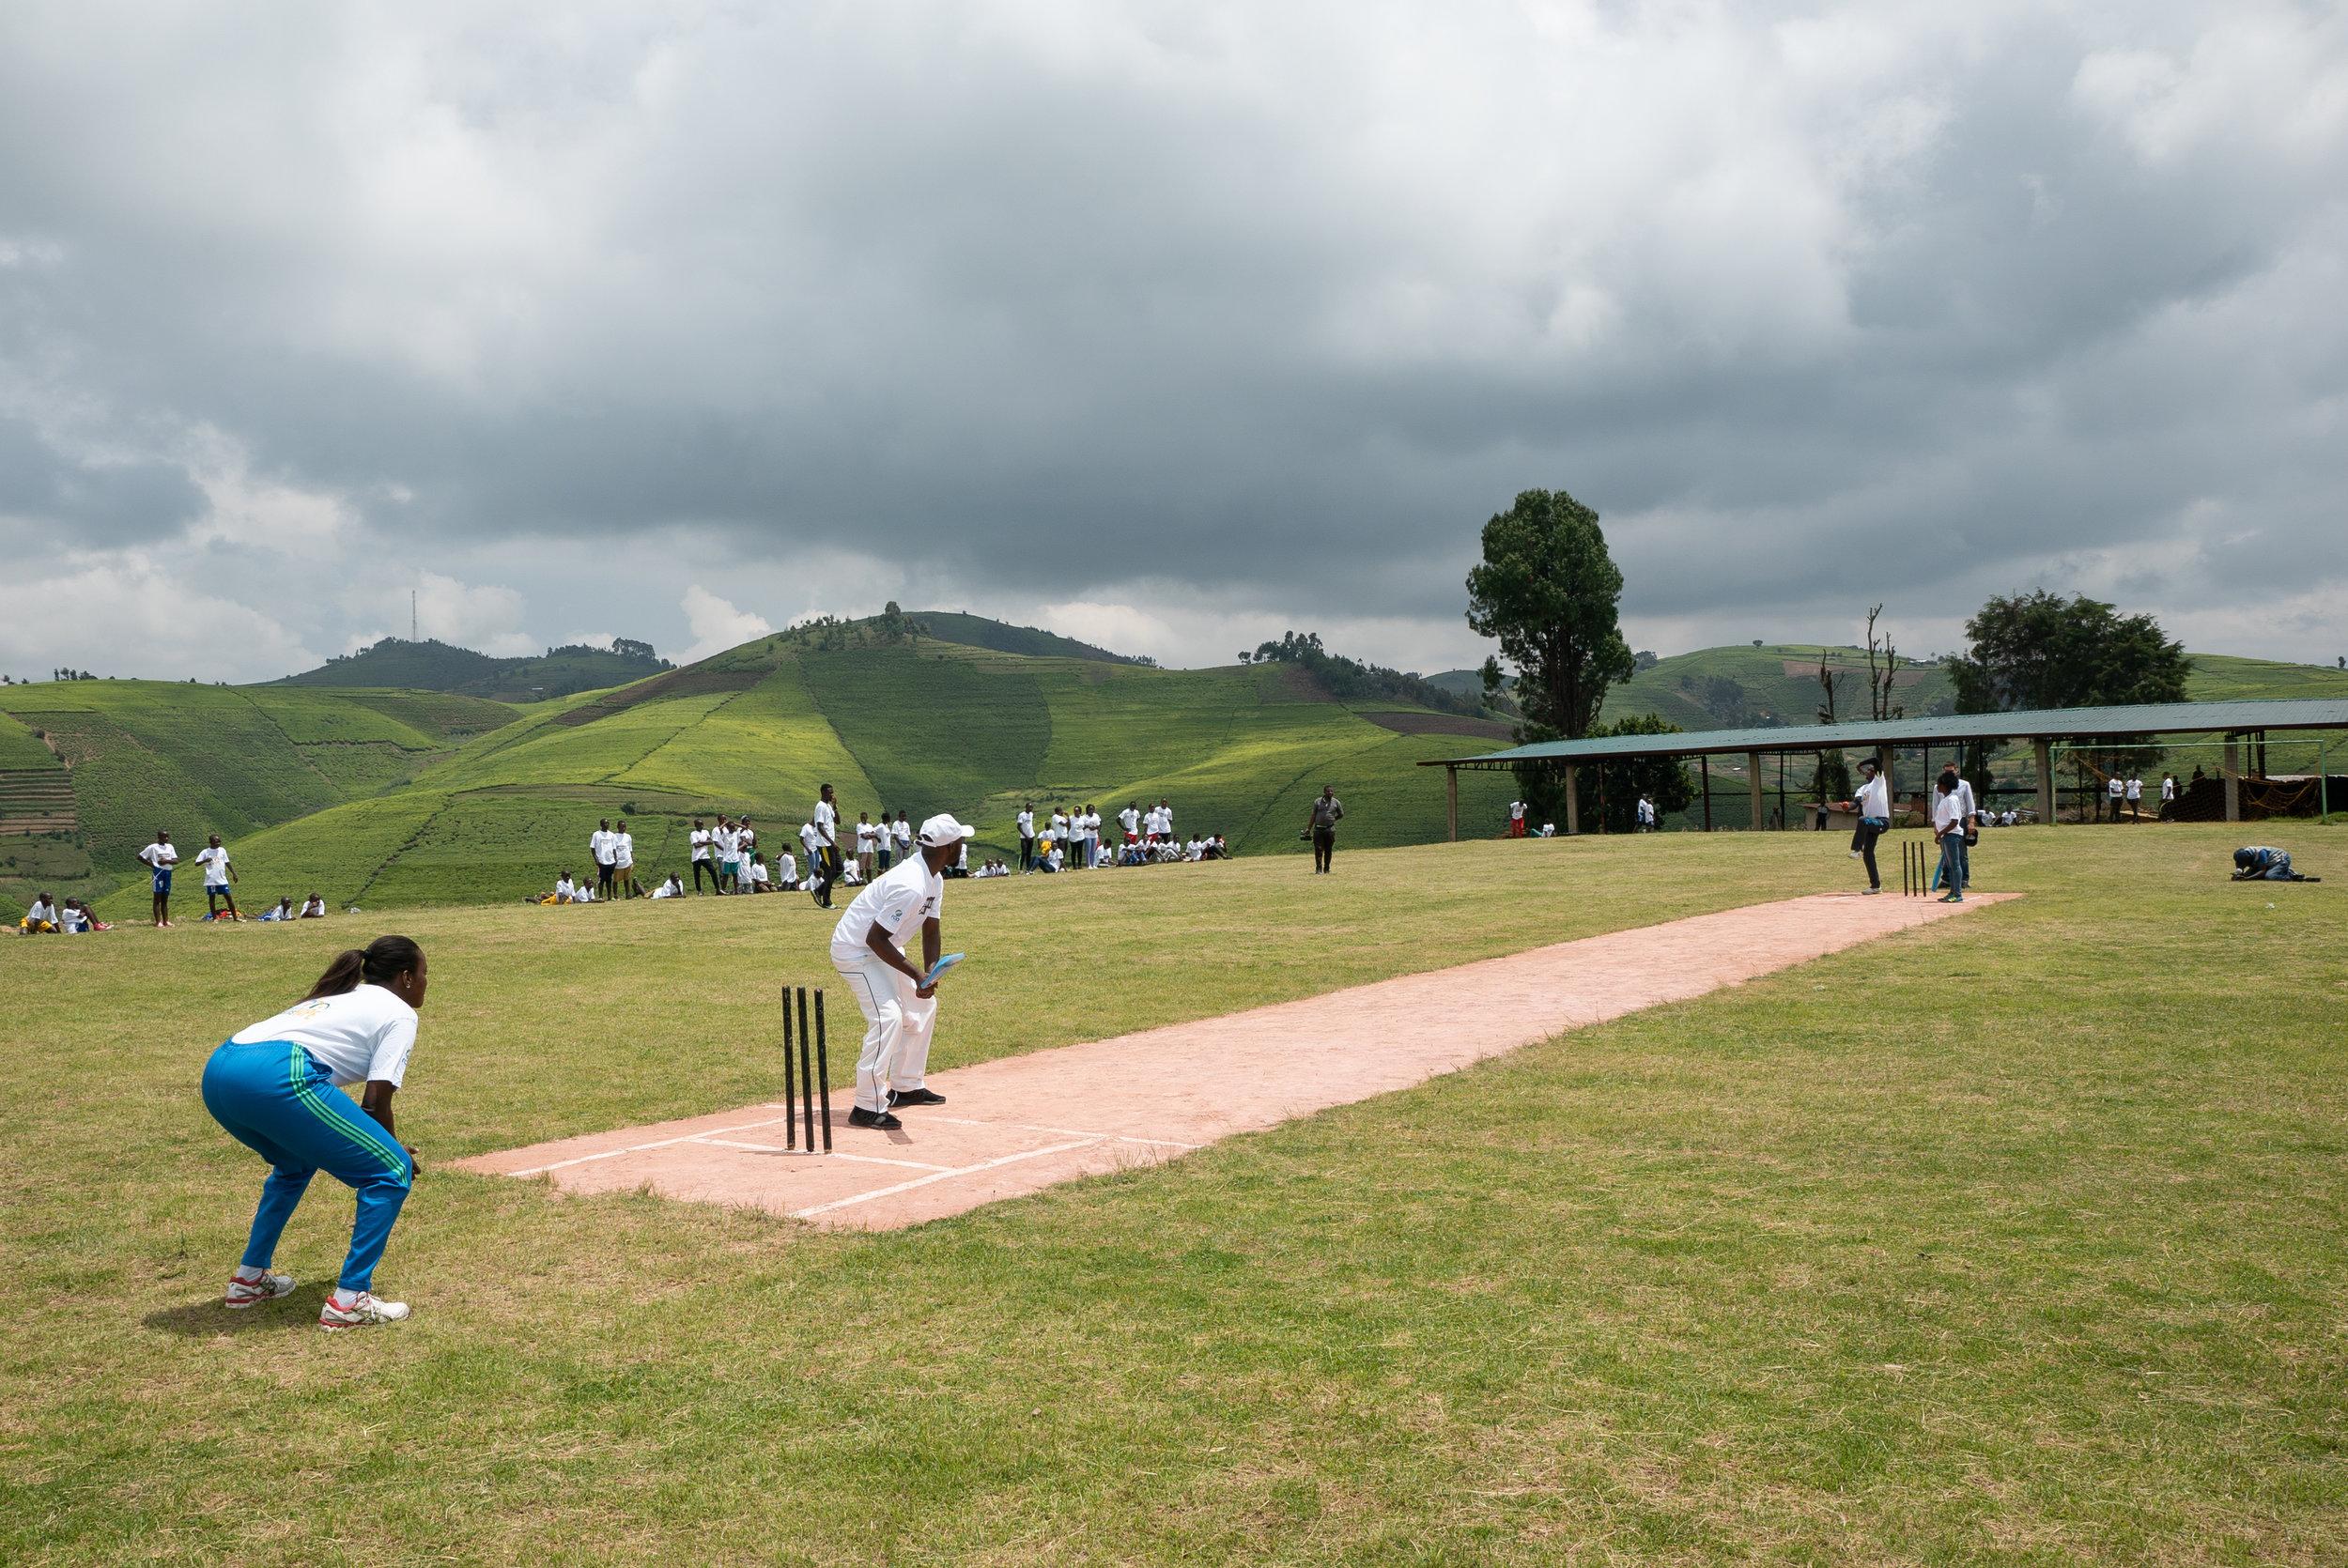 YorkshireTea_Rwanda2019-20.jpg